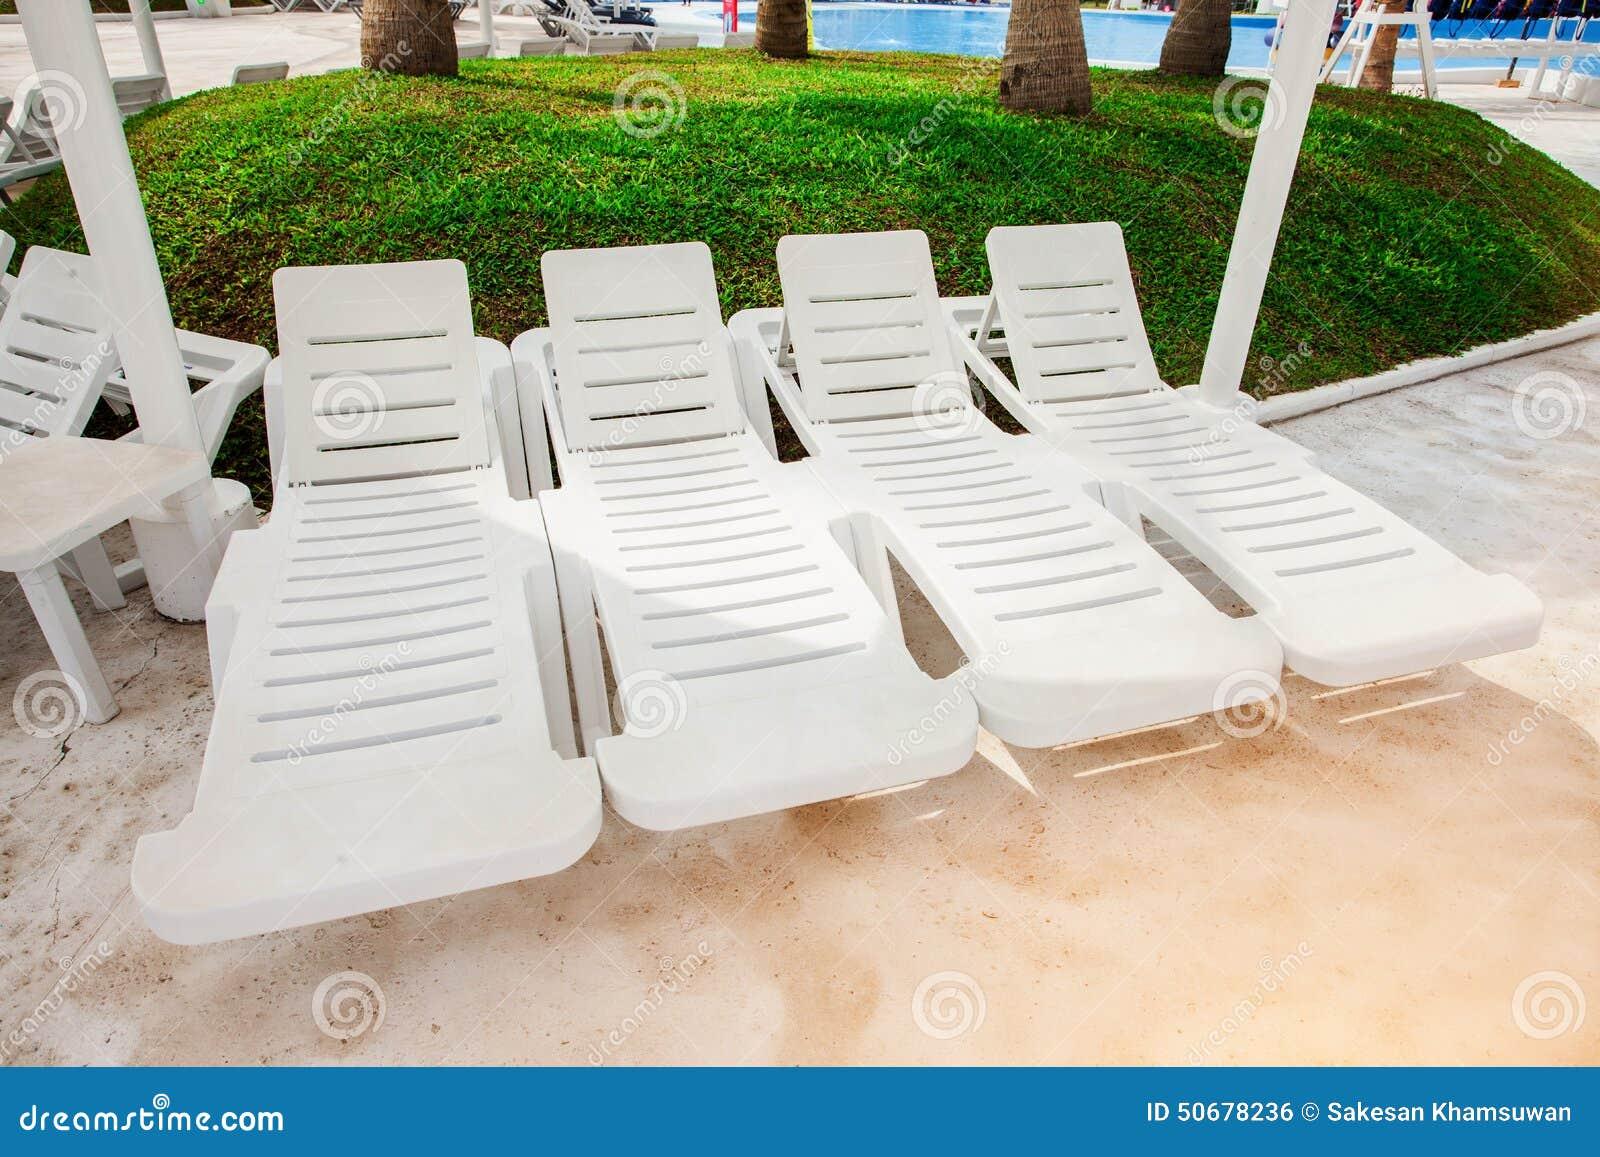 Download 白色海滩柴 库存照片. 图片 包括有 田园诗, 气候, 假期, 复制, 完美, 诱惑, 空间, 夏天, 人们 - 50678236